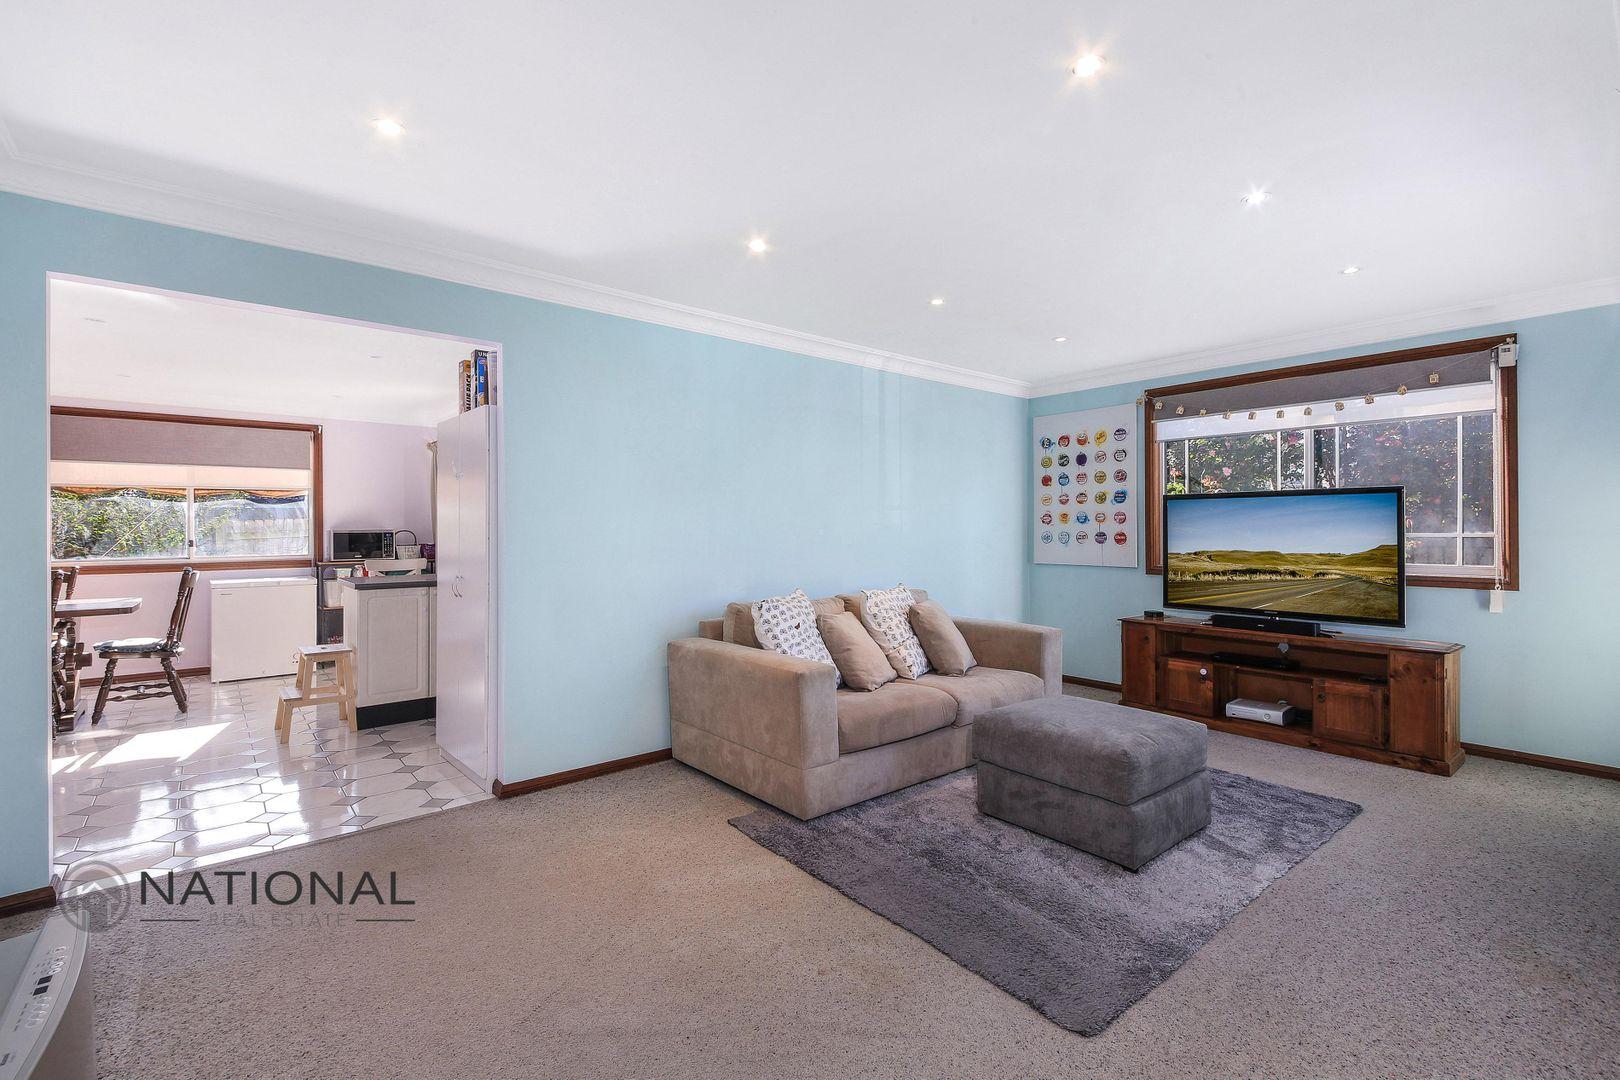 17a Taralga St, Old Guildford NSW 2161, Image 2